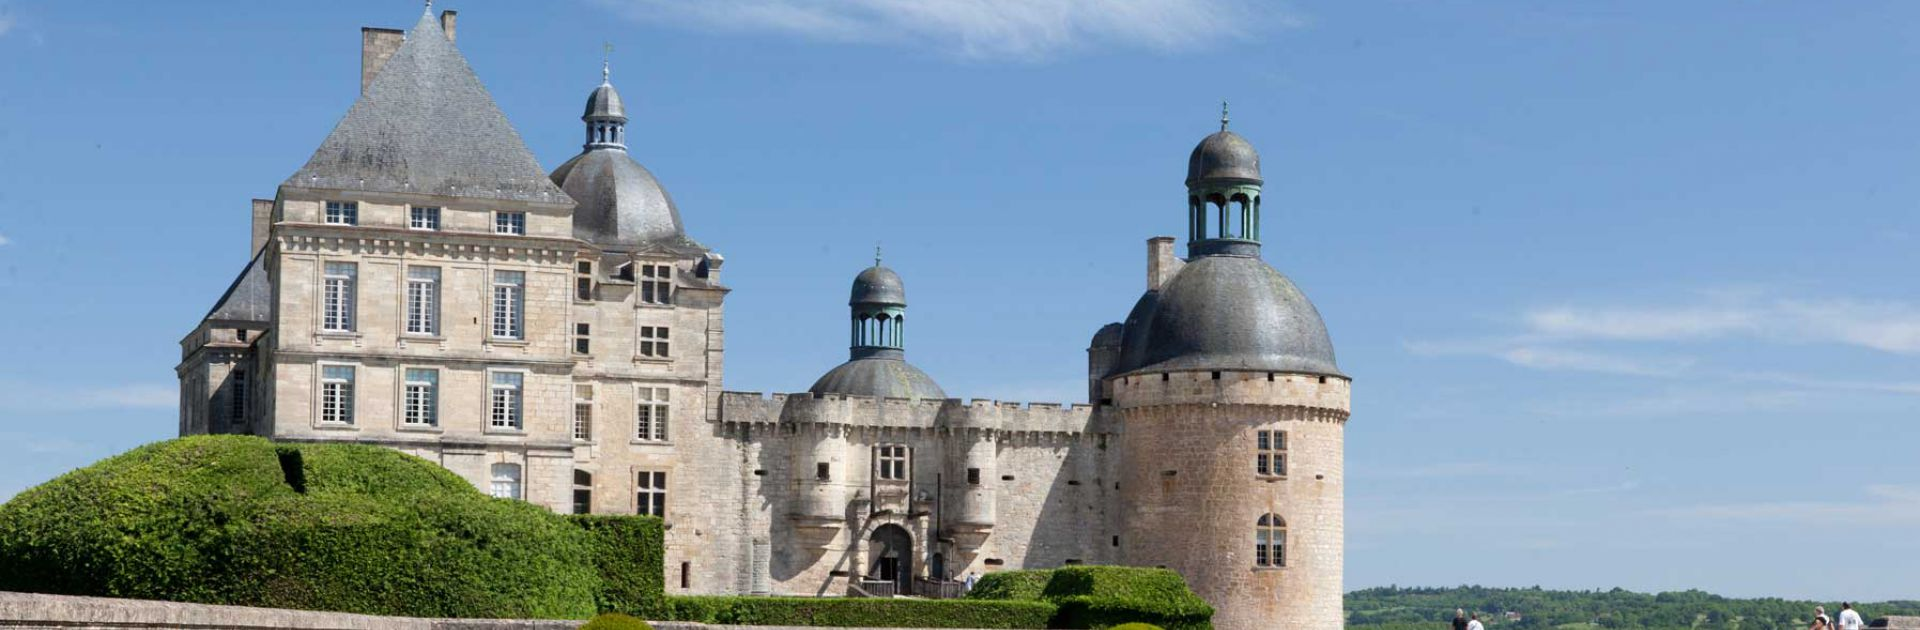 Château de Hautefort tuinen kasteel groene perigord